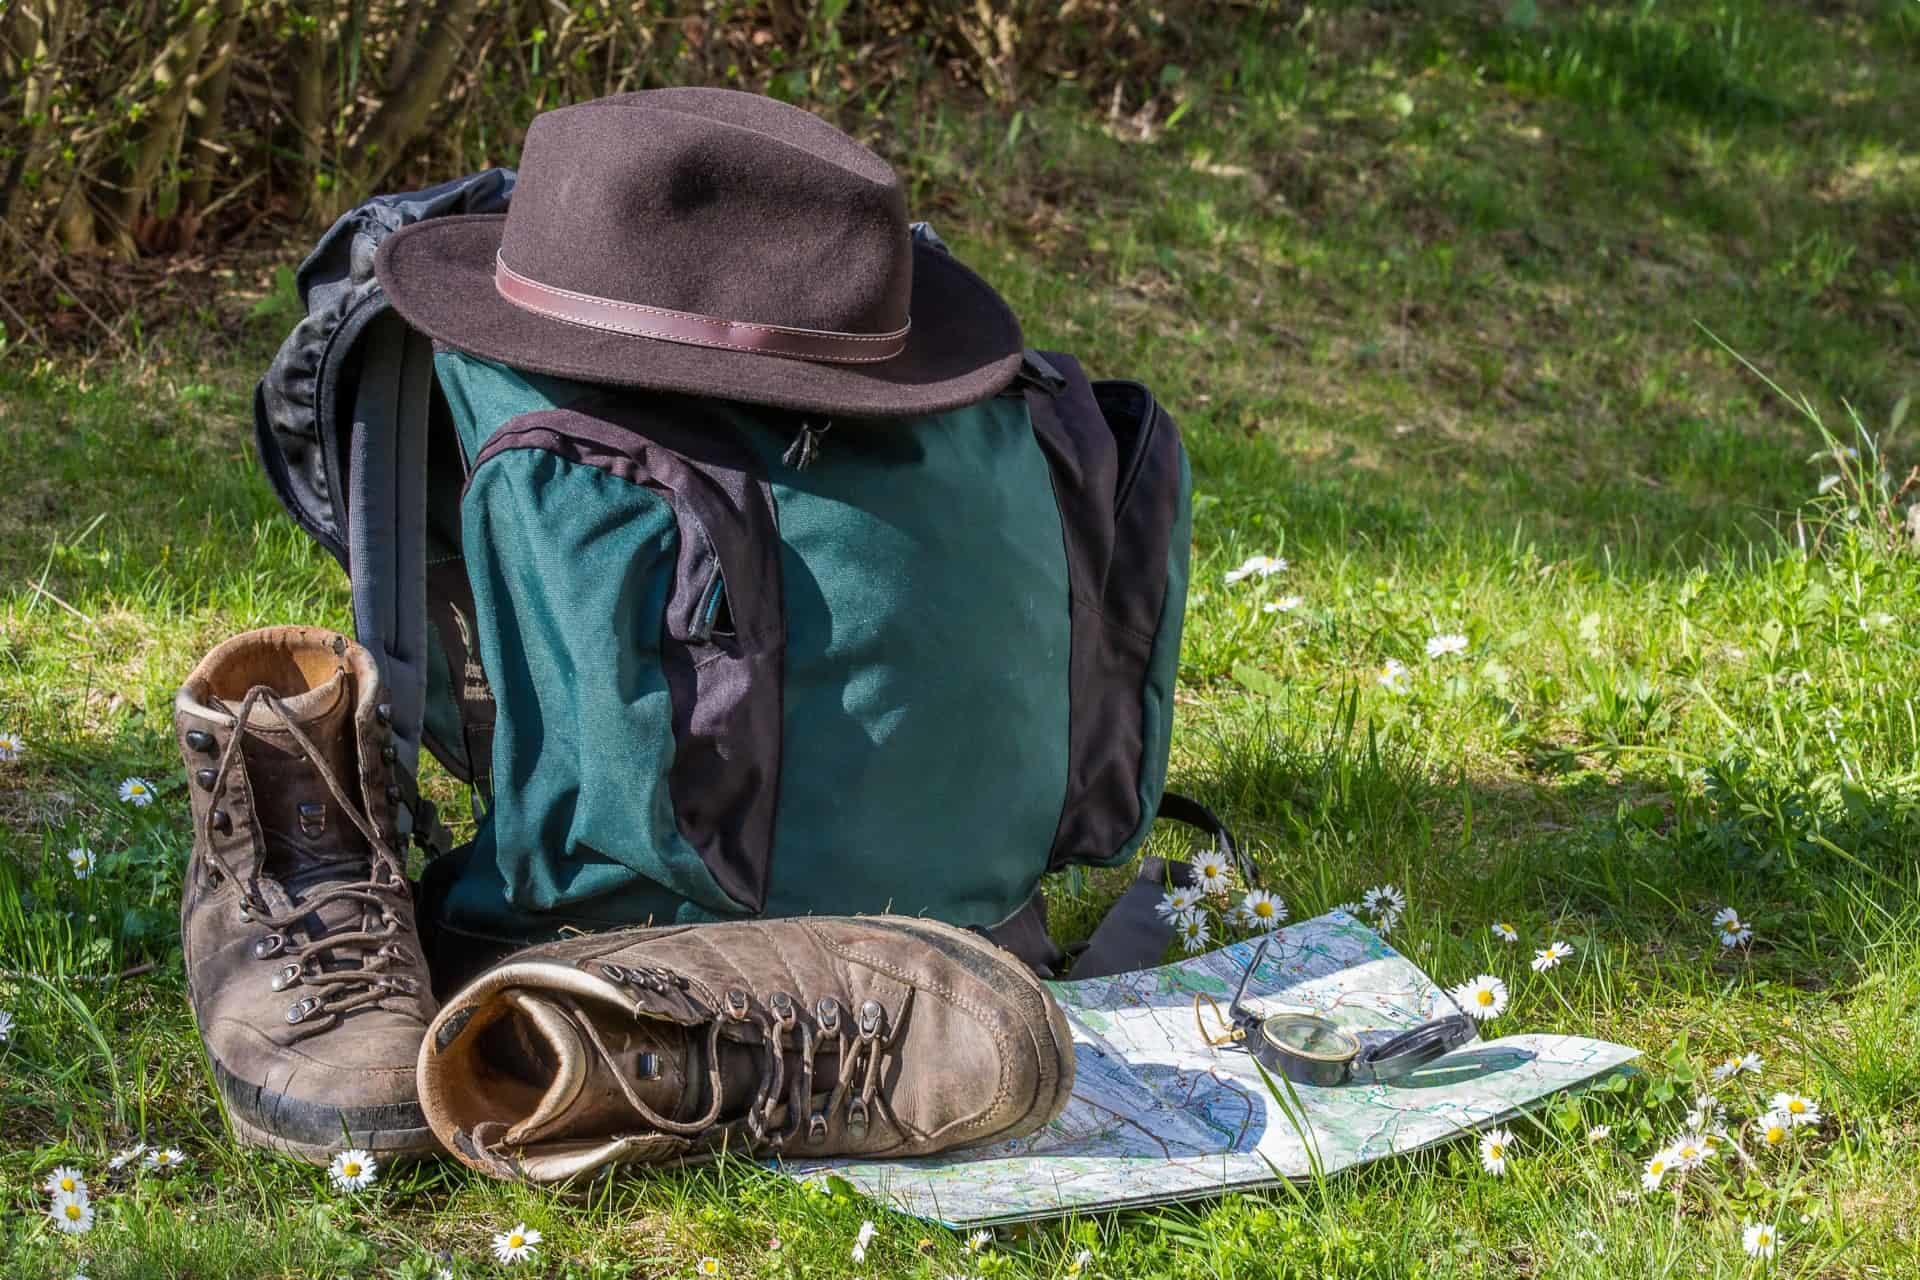 Walking and hiking shoes socks